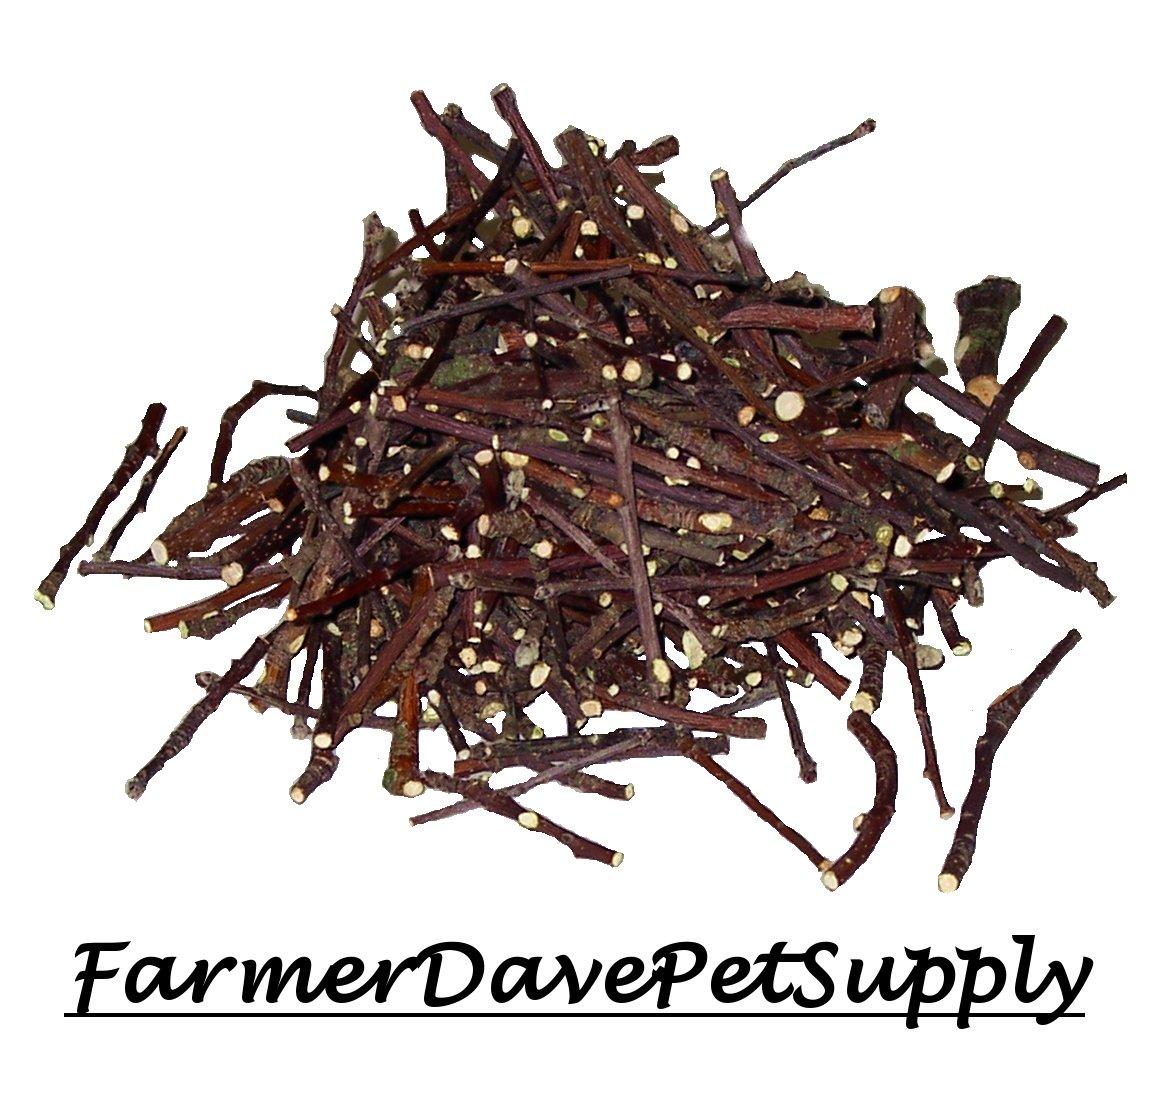 FarmerDavePetSupply 350 Apple Chew Nibbles for Pets by FarmerDavePetSupply